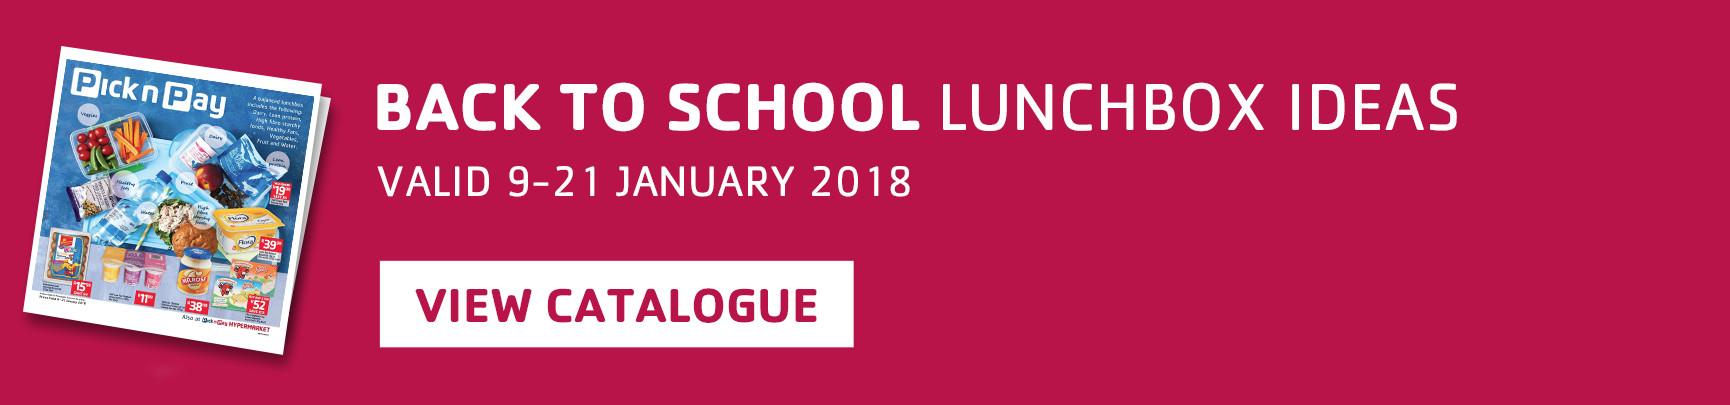 BACK TO SCHOOL LUNCHBOX IDEAS 2018.jpg